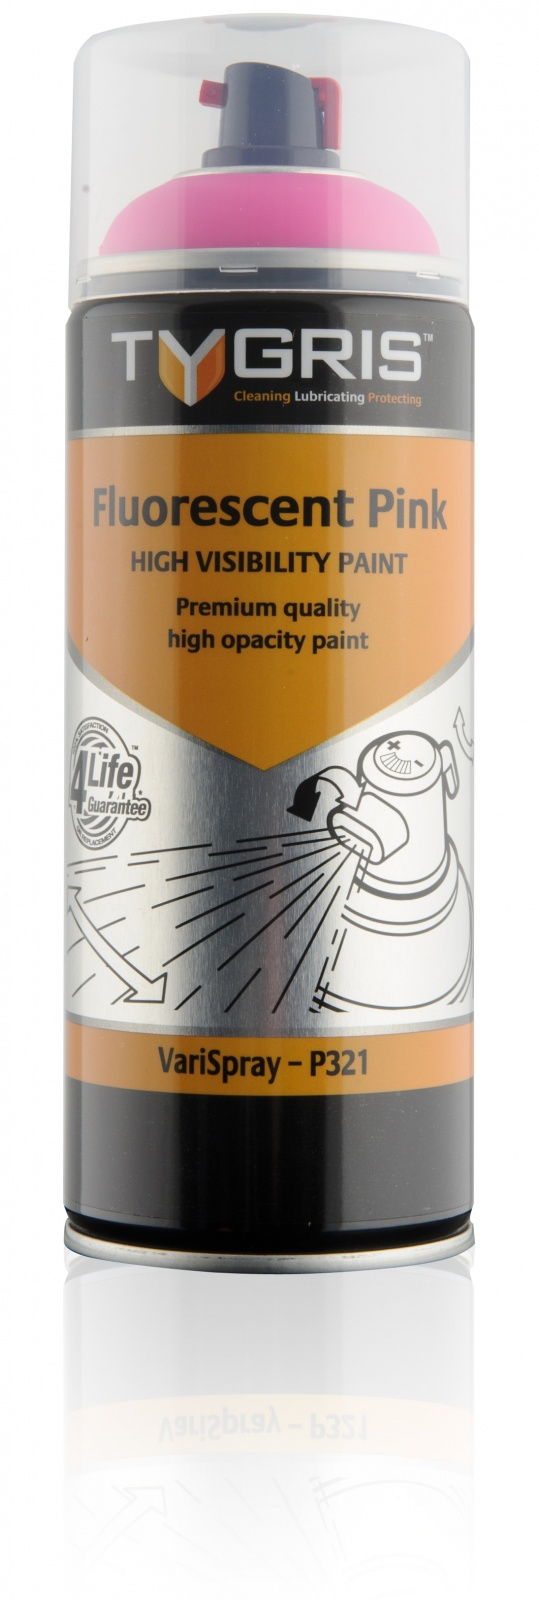 P321 Pink Safety Paint 400ml Vari-Spray